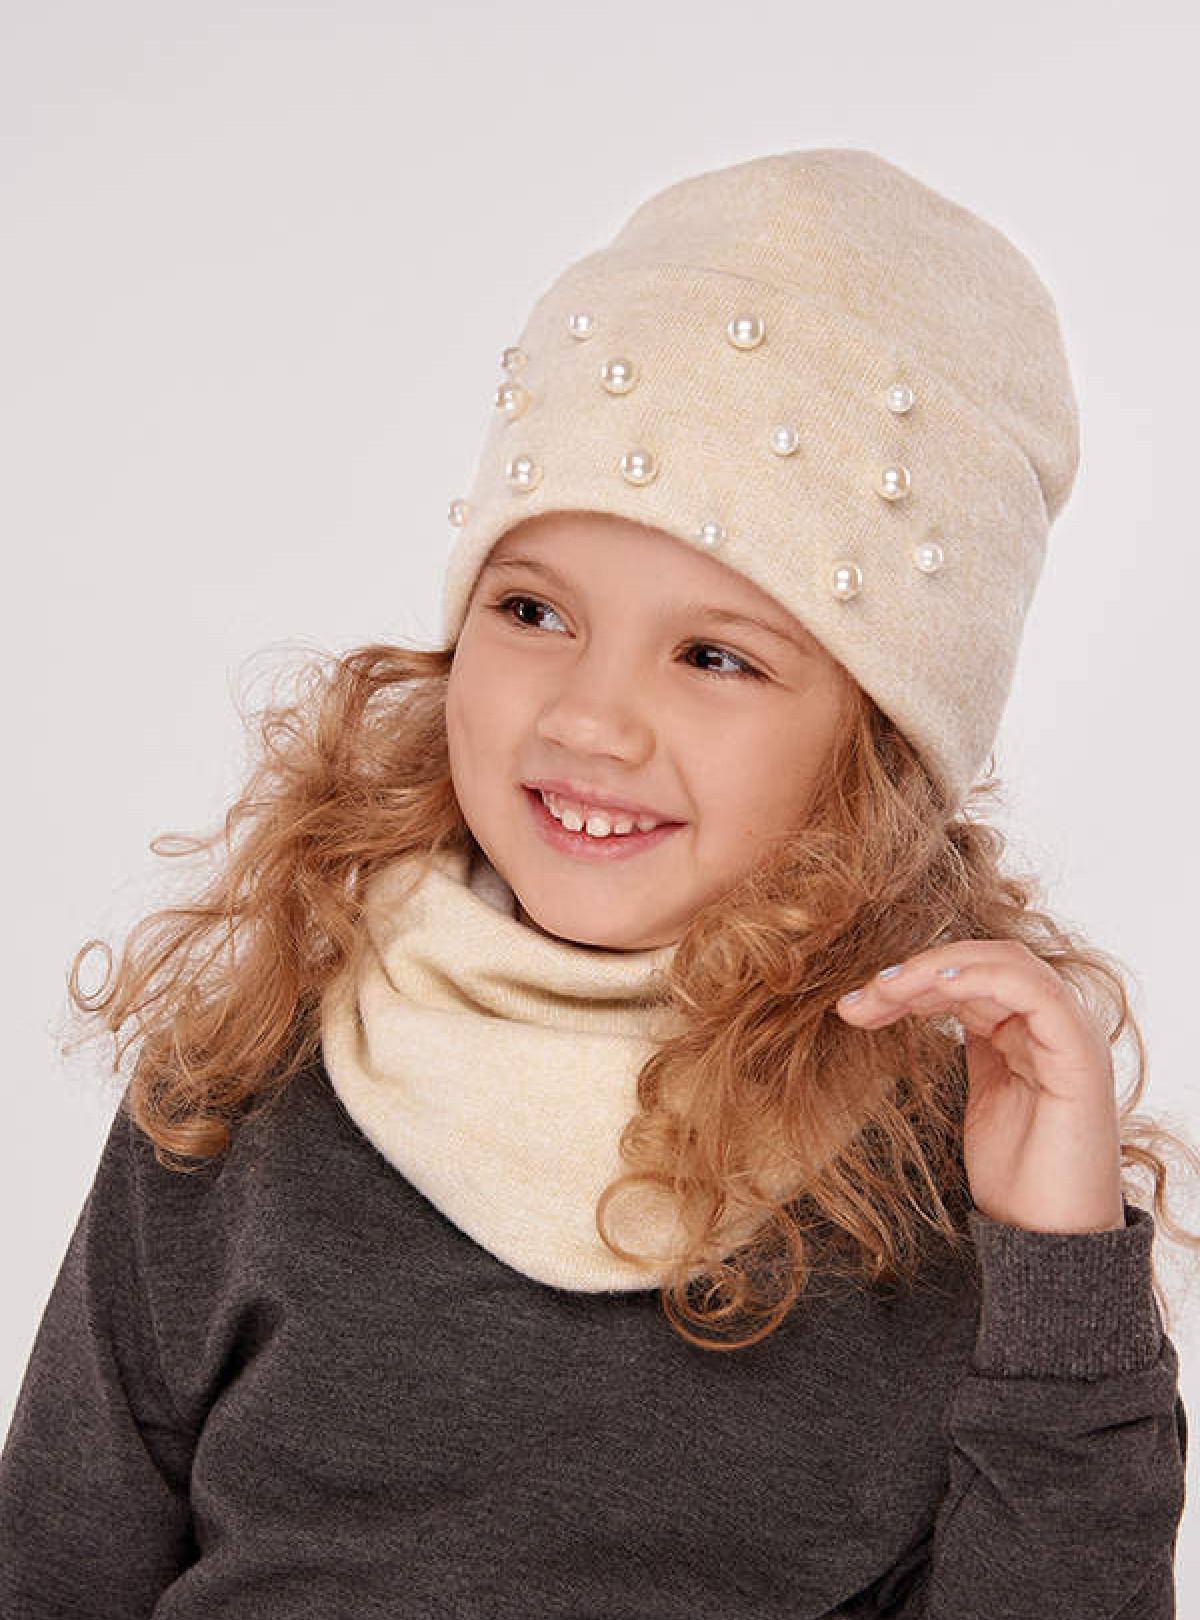 Осенняя шапка Сандал (набор) крем Dembohouse   760